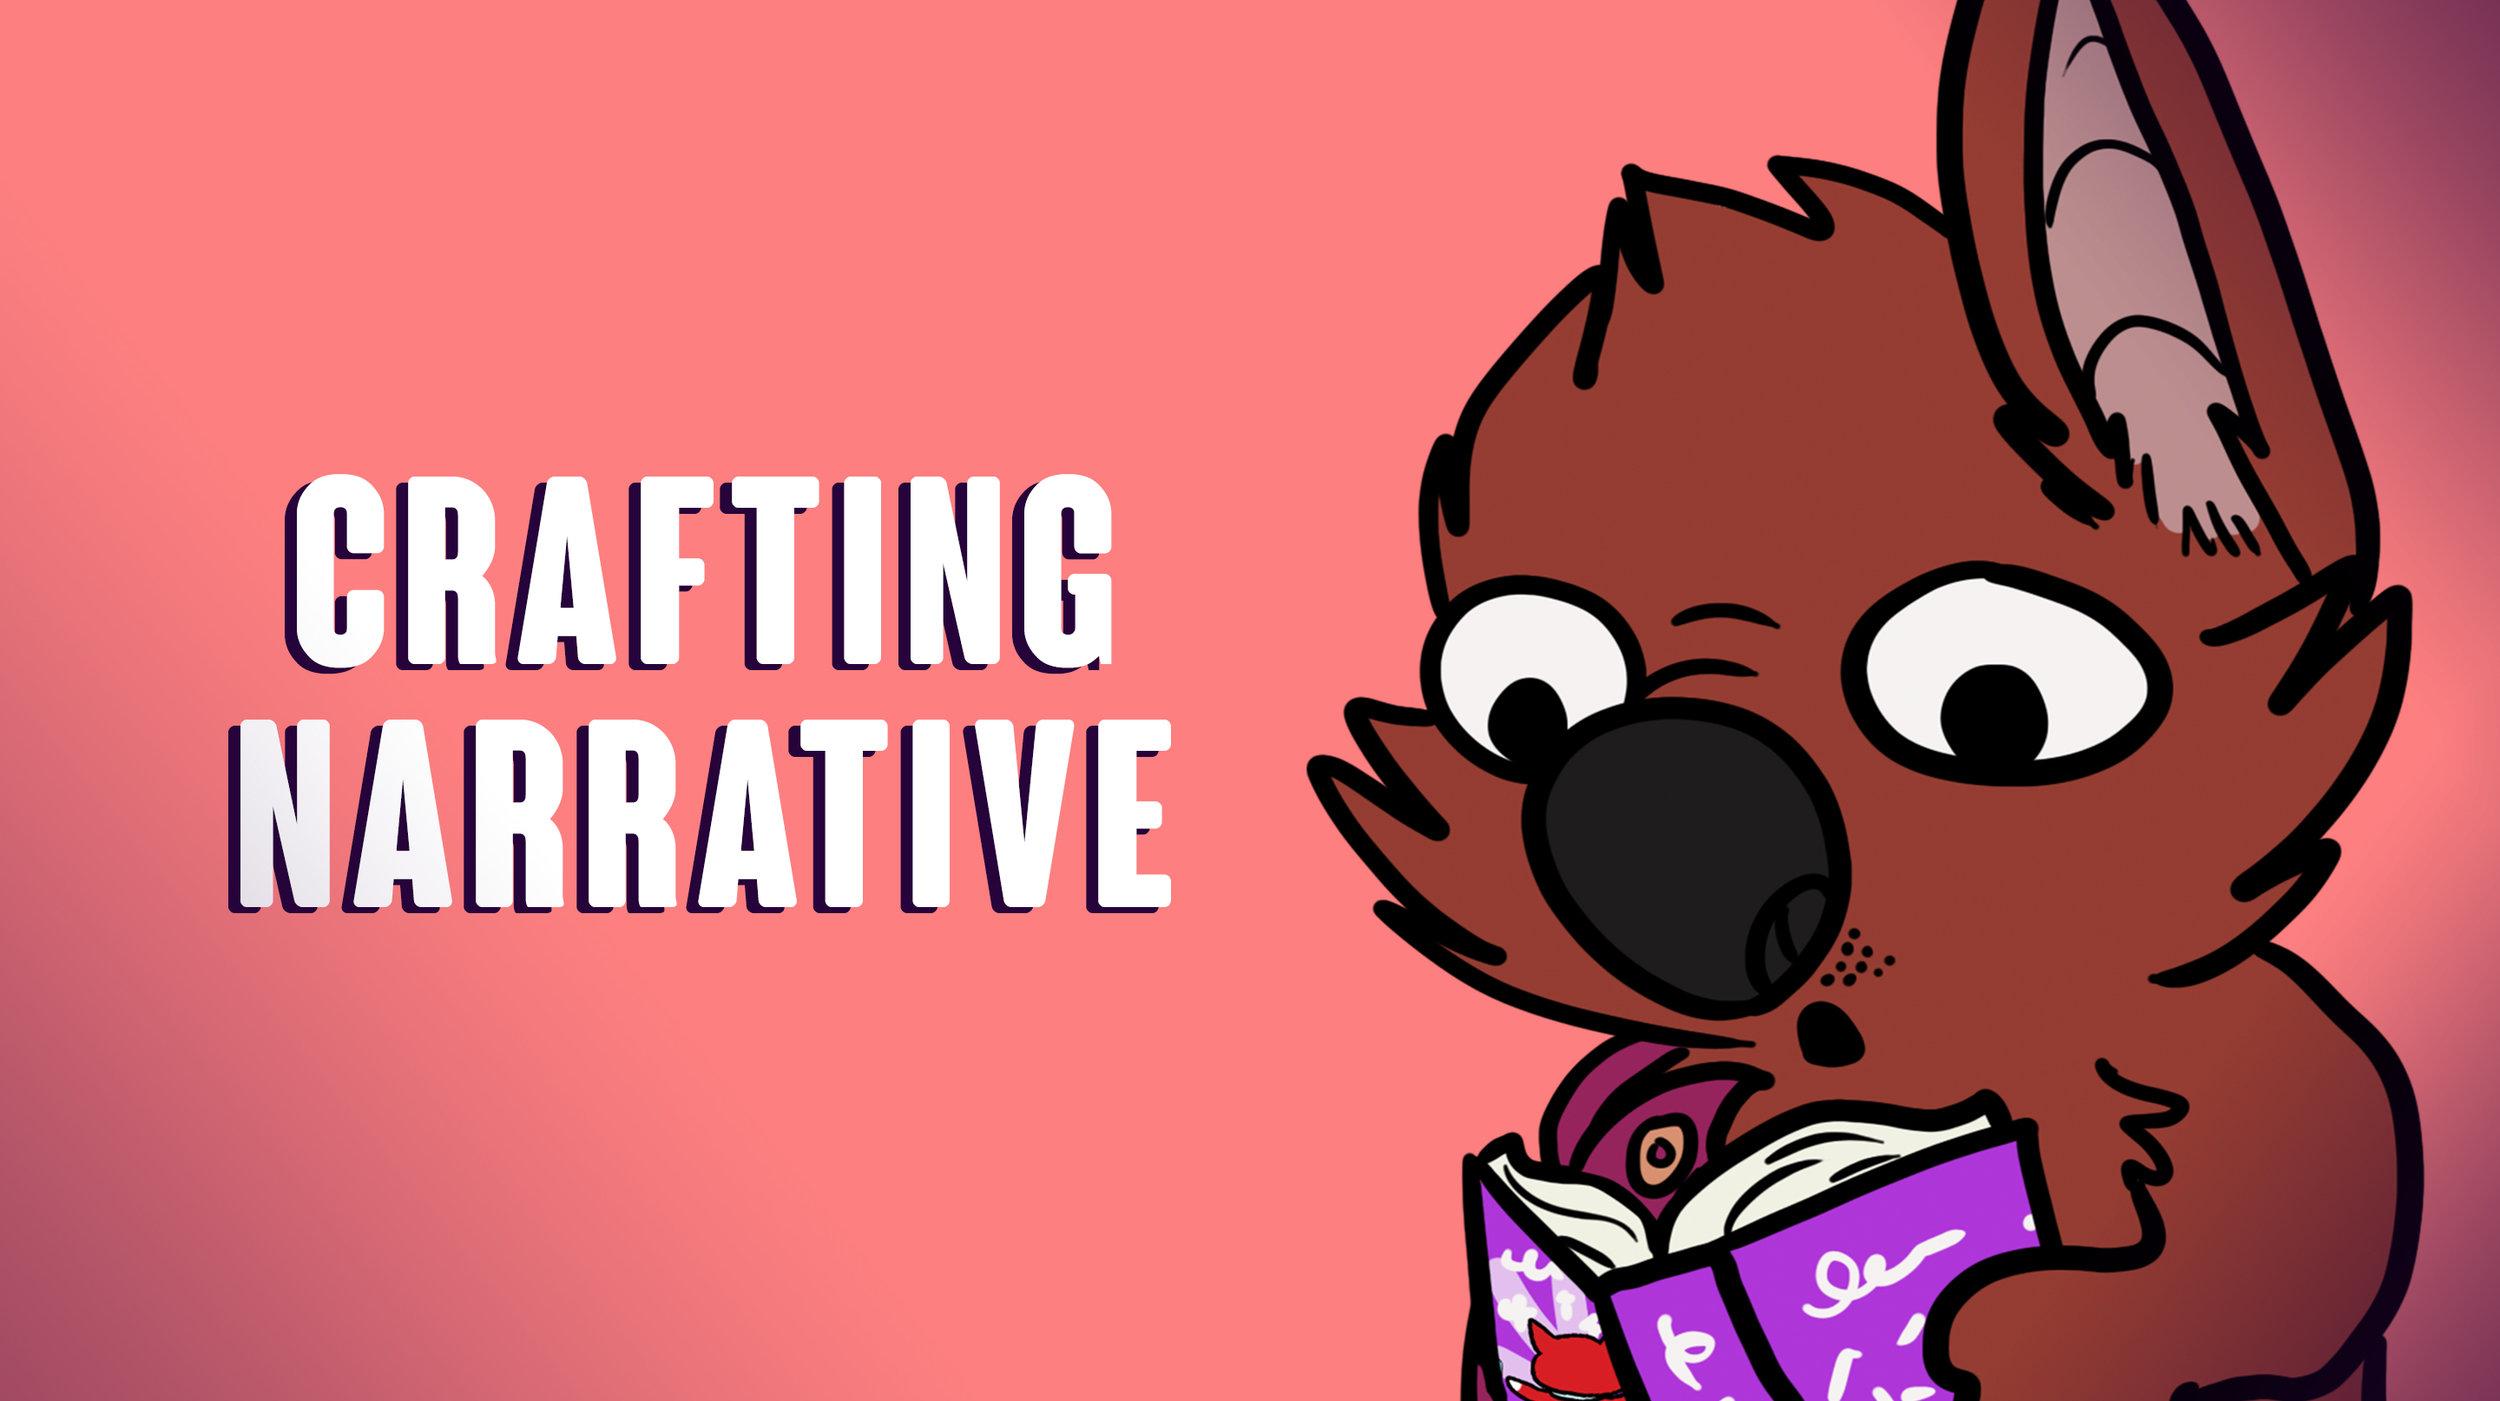 ClassCraftingNarrative.jpg